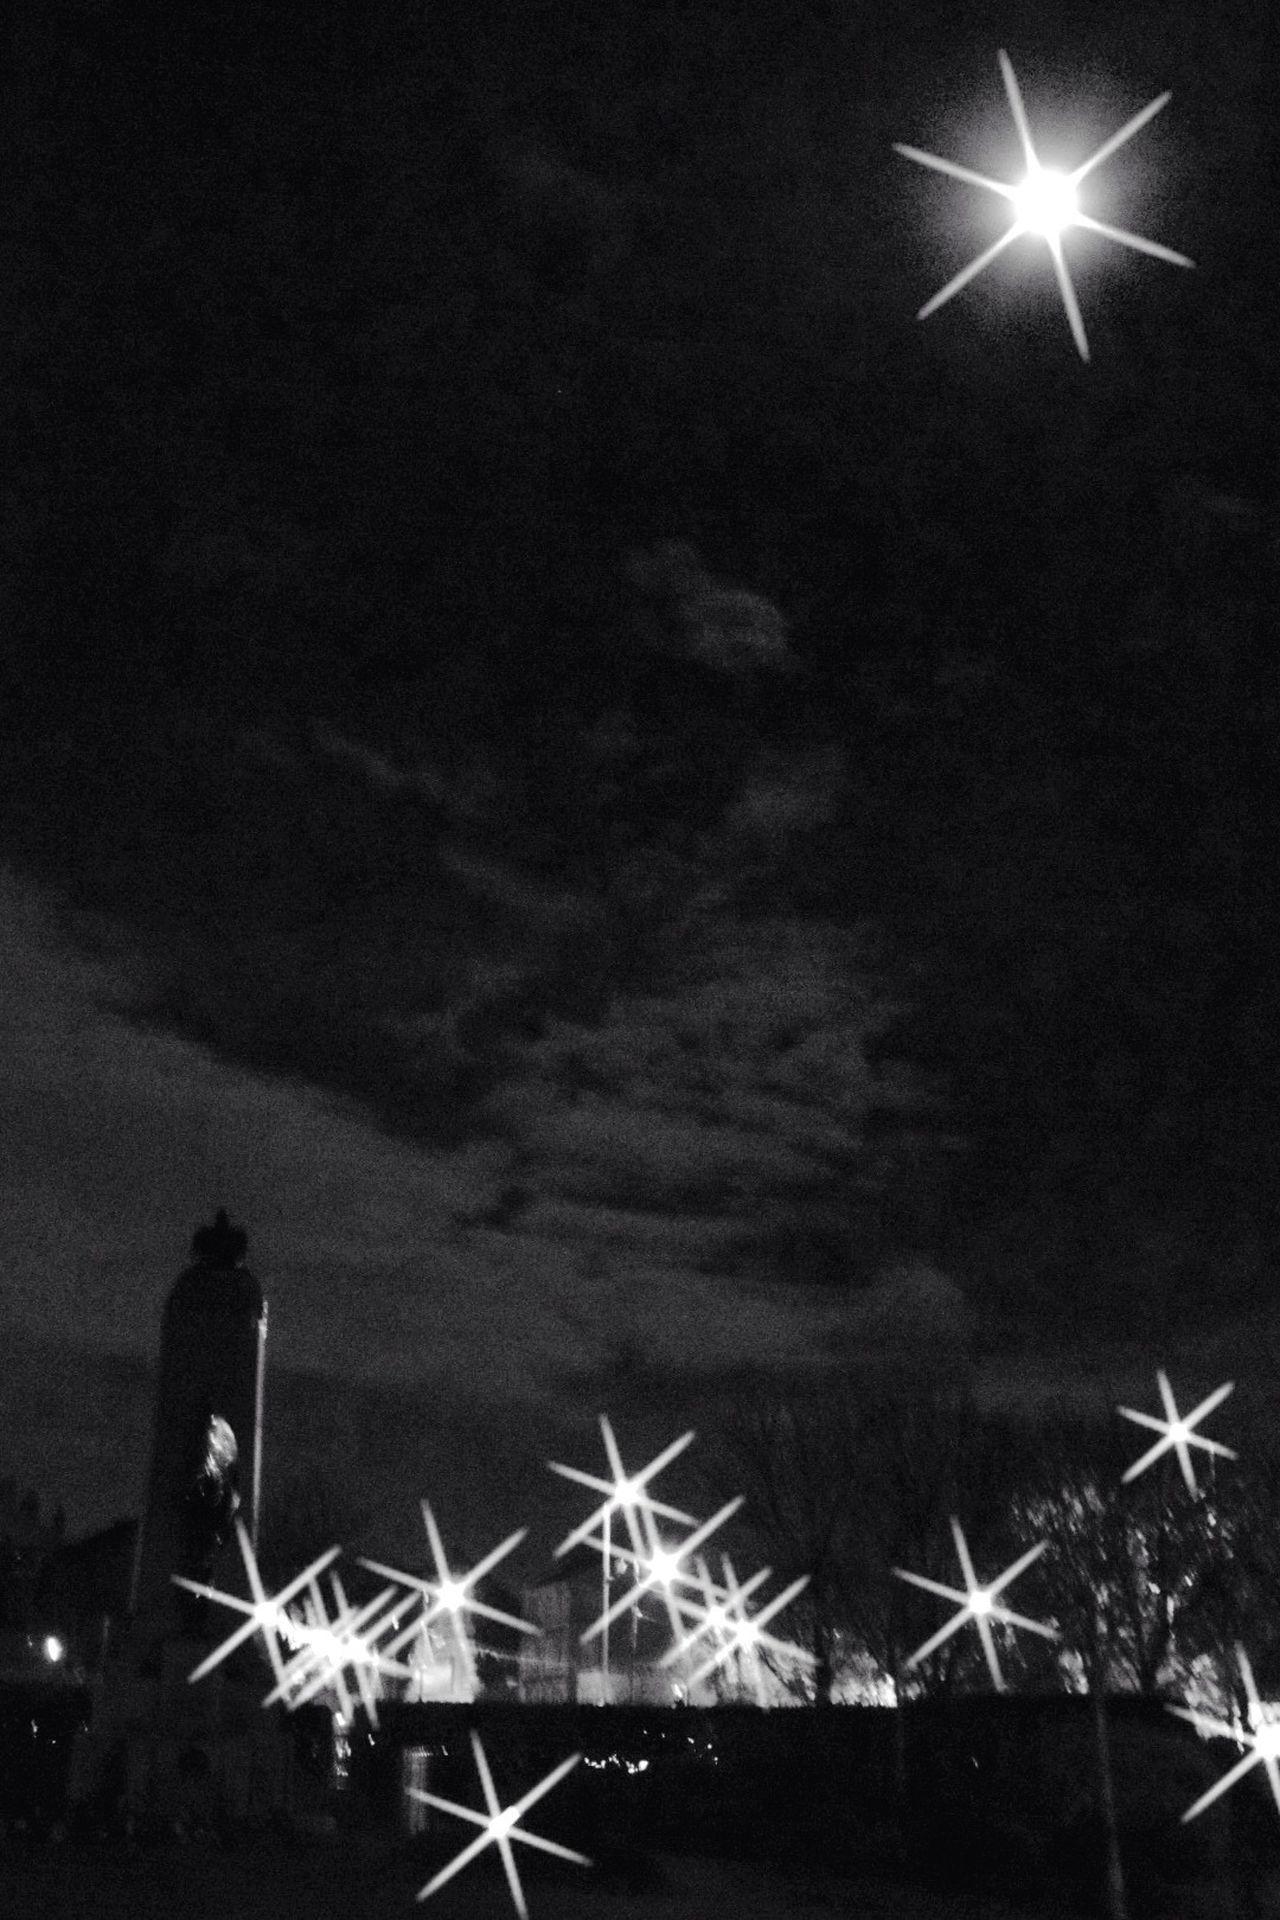 Sparkling, shiny full moon ... Sky Night No People Outdoors Black And White Black & White Glasgow  Scotland Urban Photography Eyeemphoto Full Moon Street Photography Streetphoto_bw Lights Street Lights Sparkle Shine